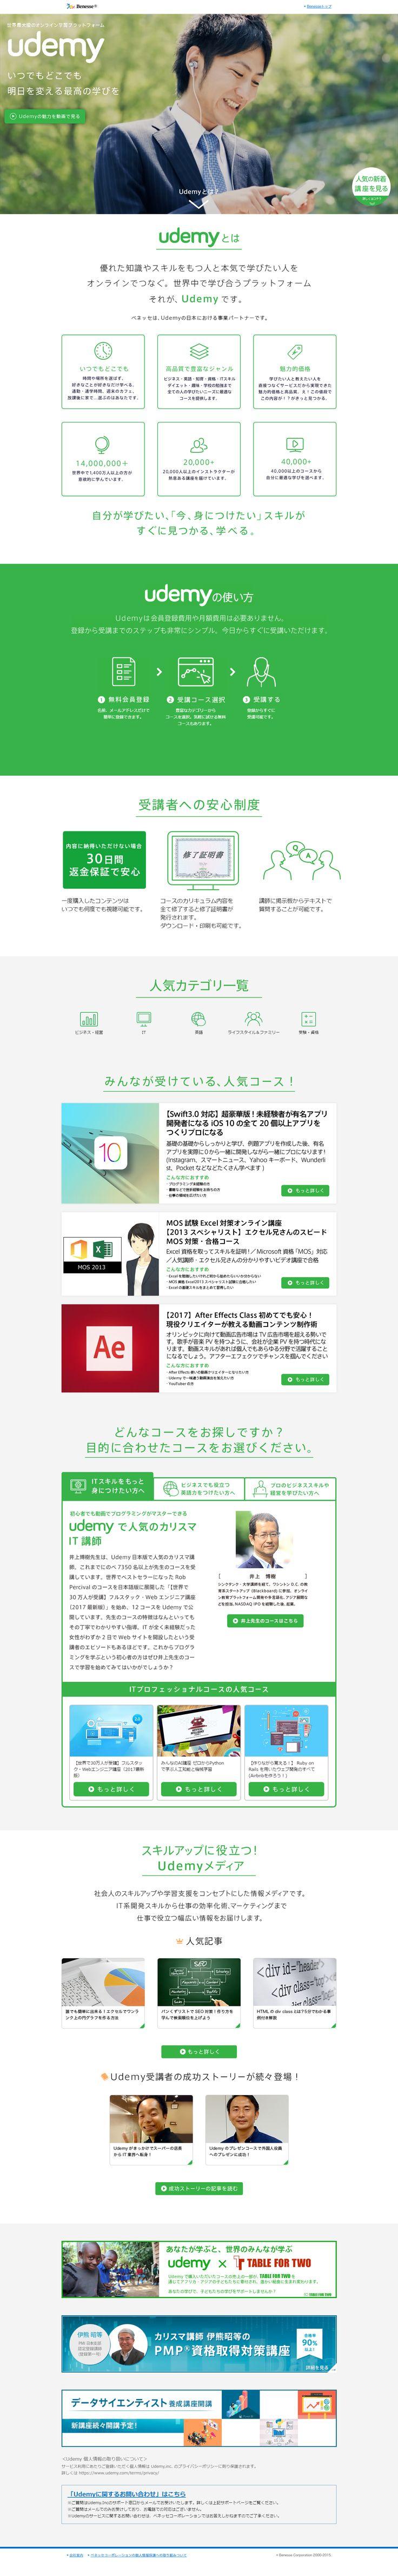 udemy|WEBデザイナーさん必見!ランディングページのデザイン参考に(シンプル系)